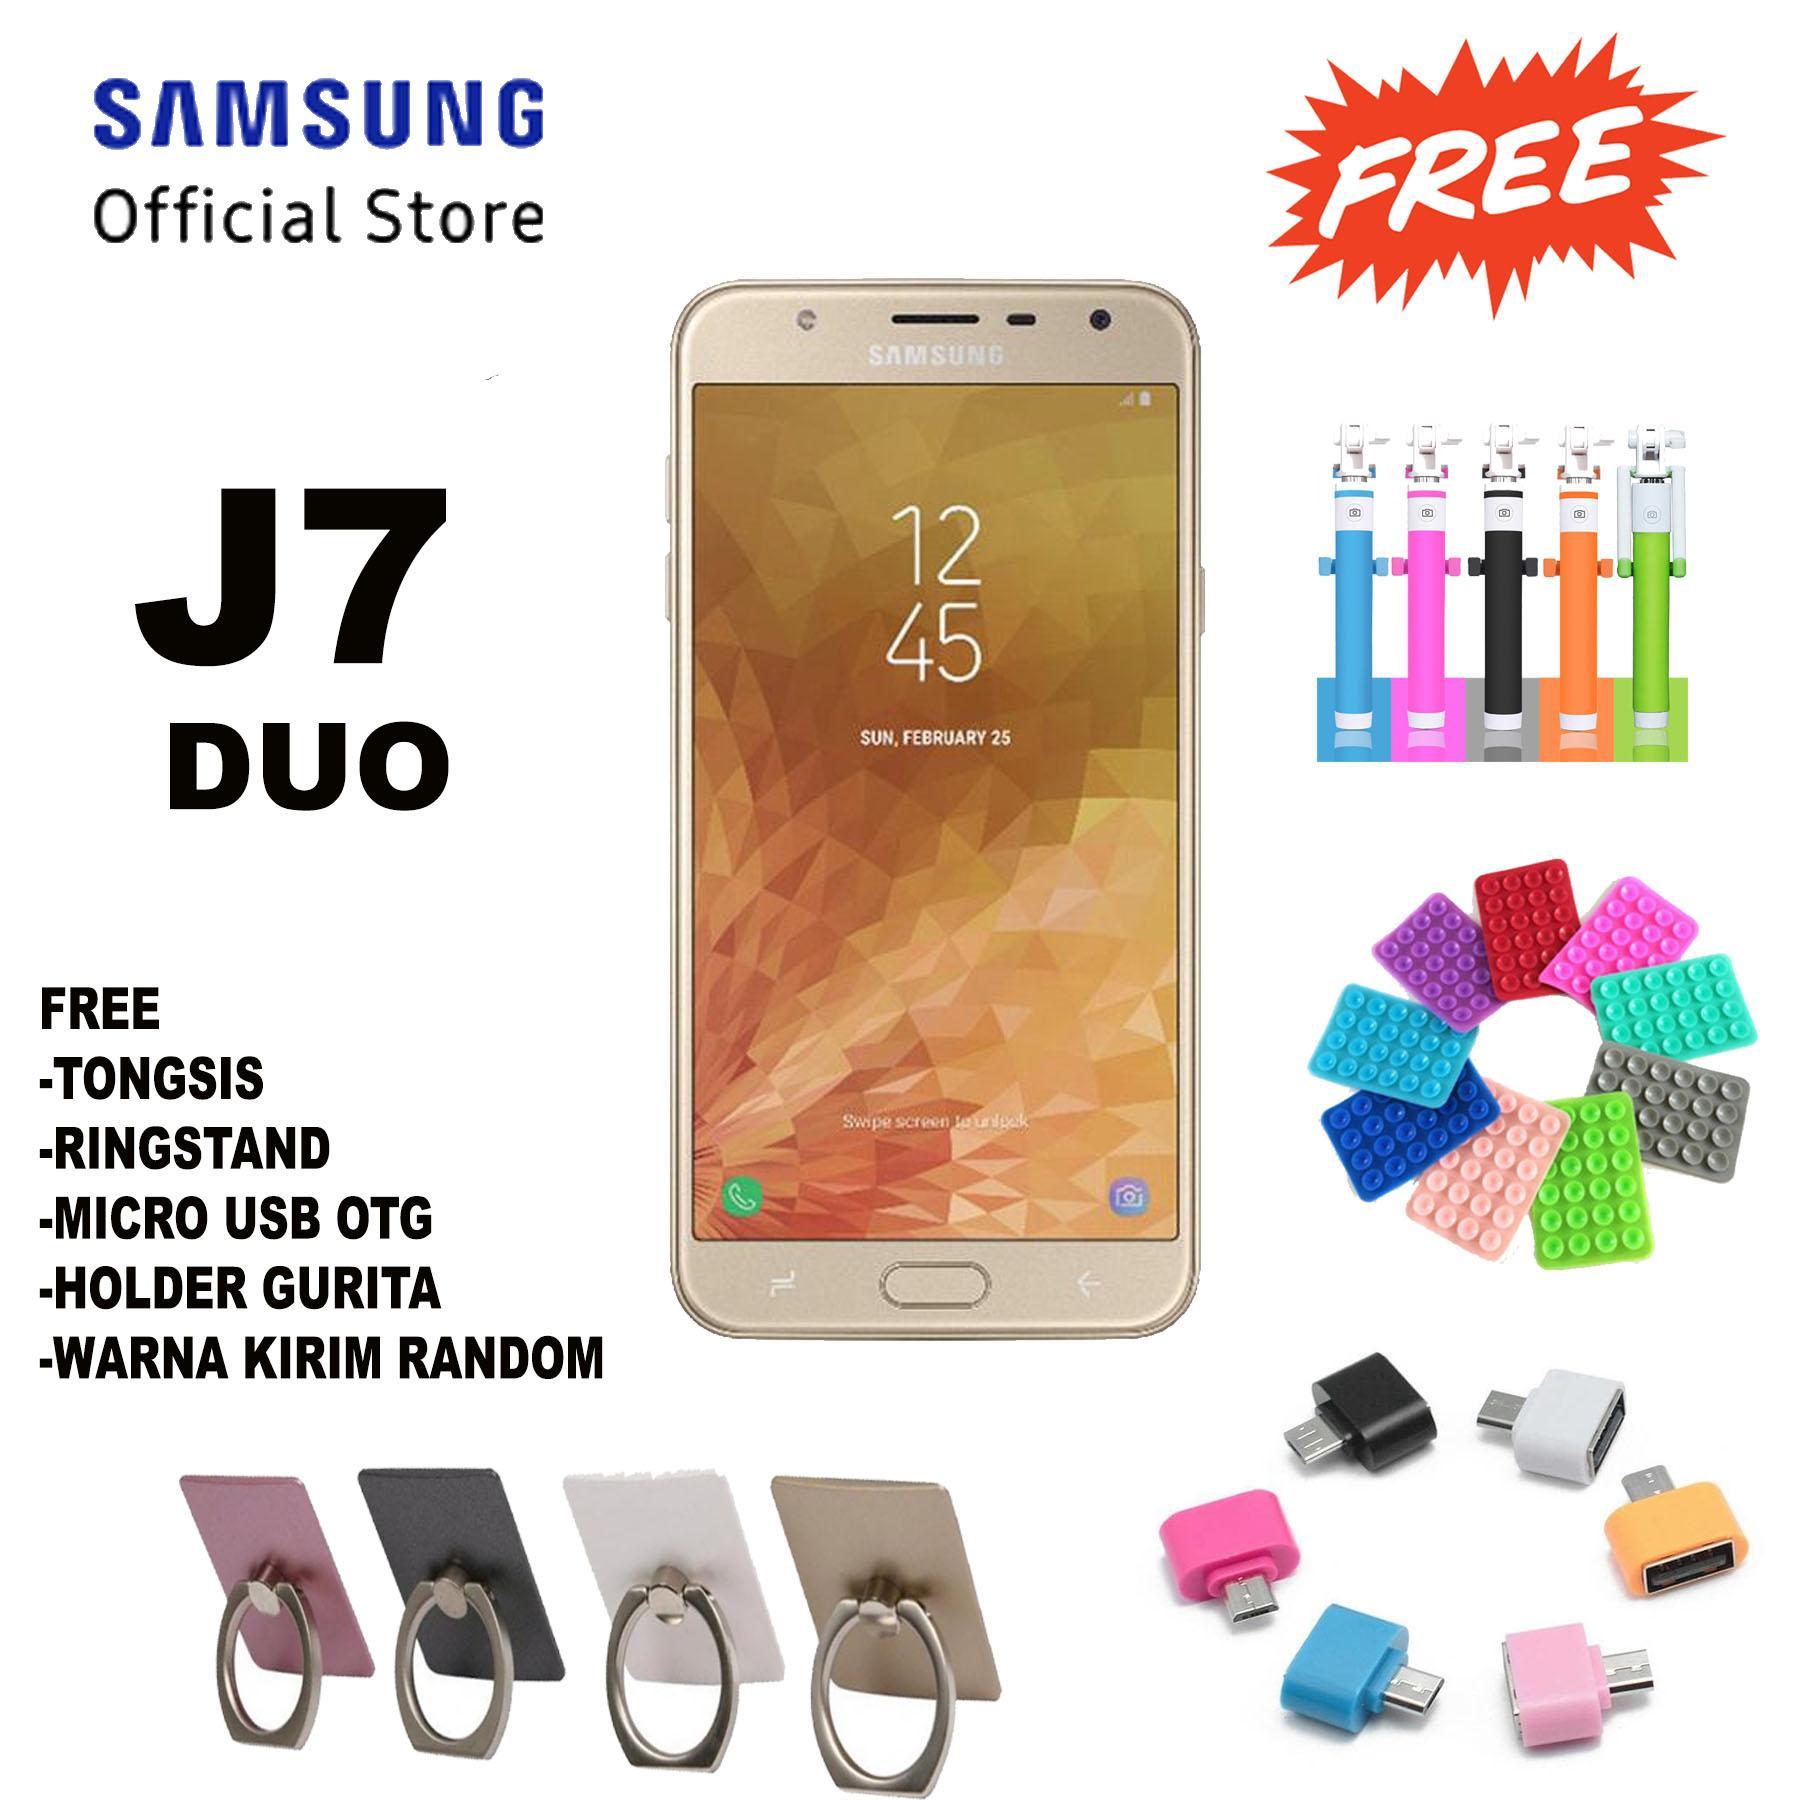 Samsung Galaxy J7 Duo - J720 - 3/32GB - Android 8.0 (Oreo) - Garansi Resmi